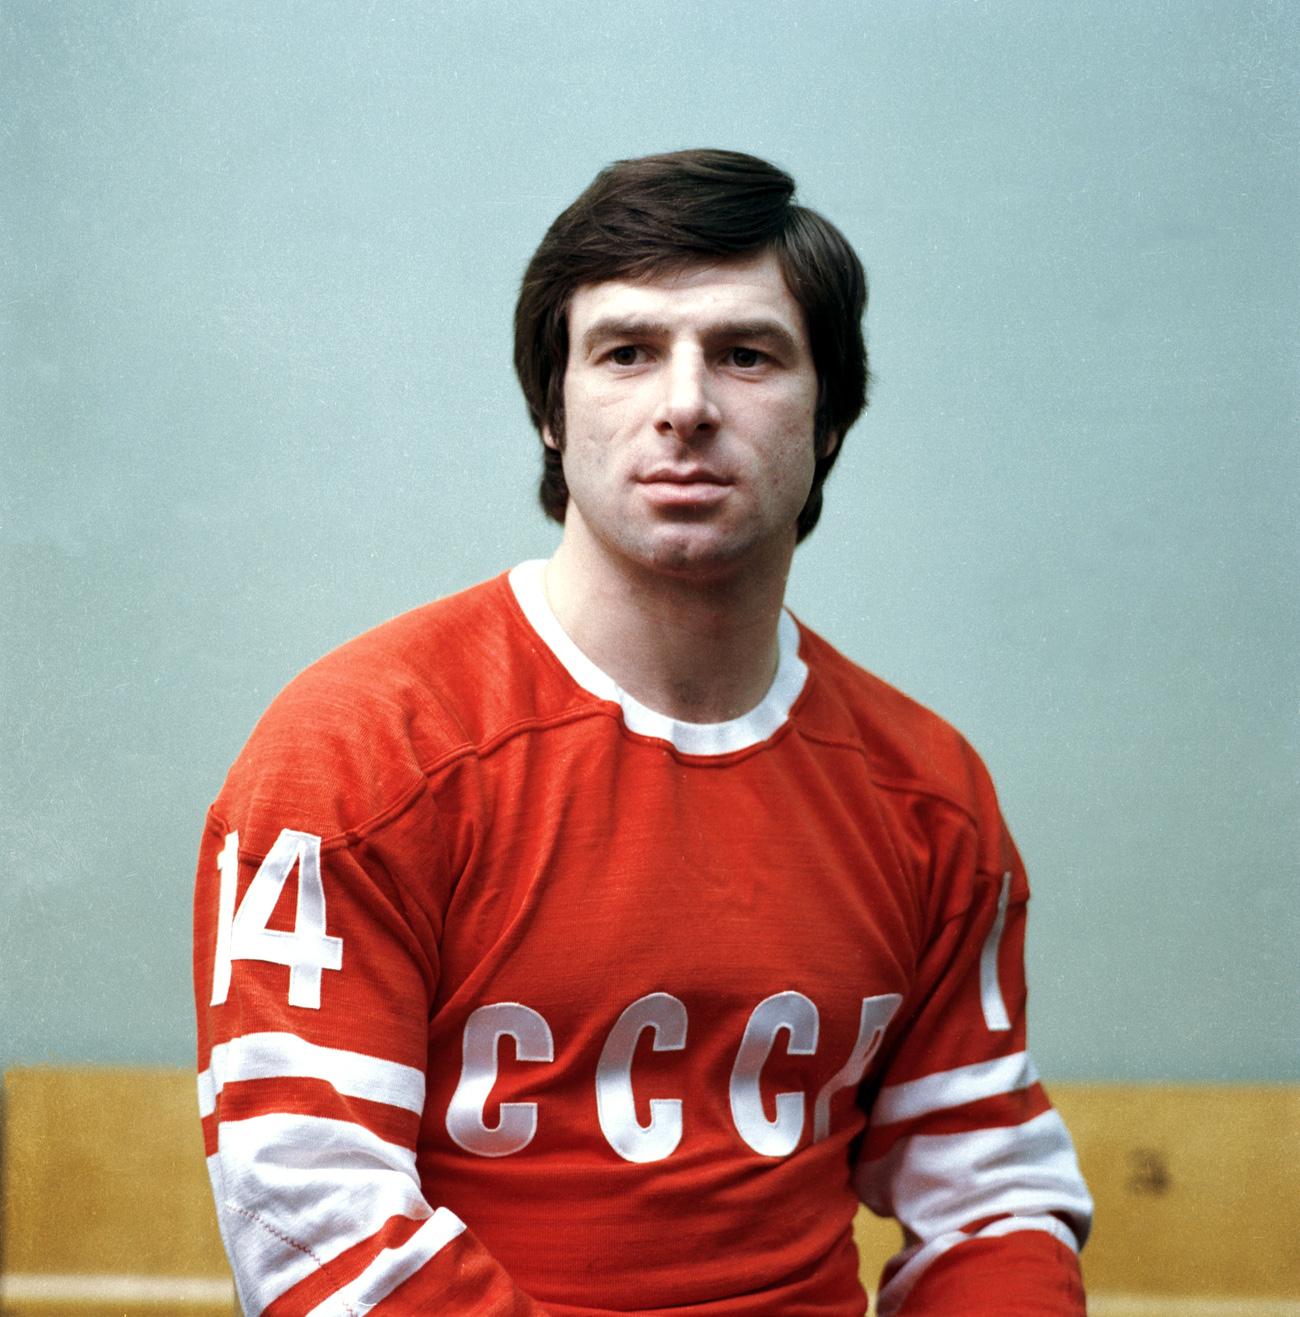 Ilustracija: Jurij Somov /RIA Novosti